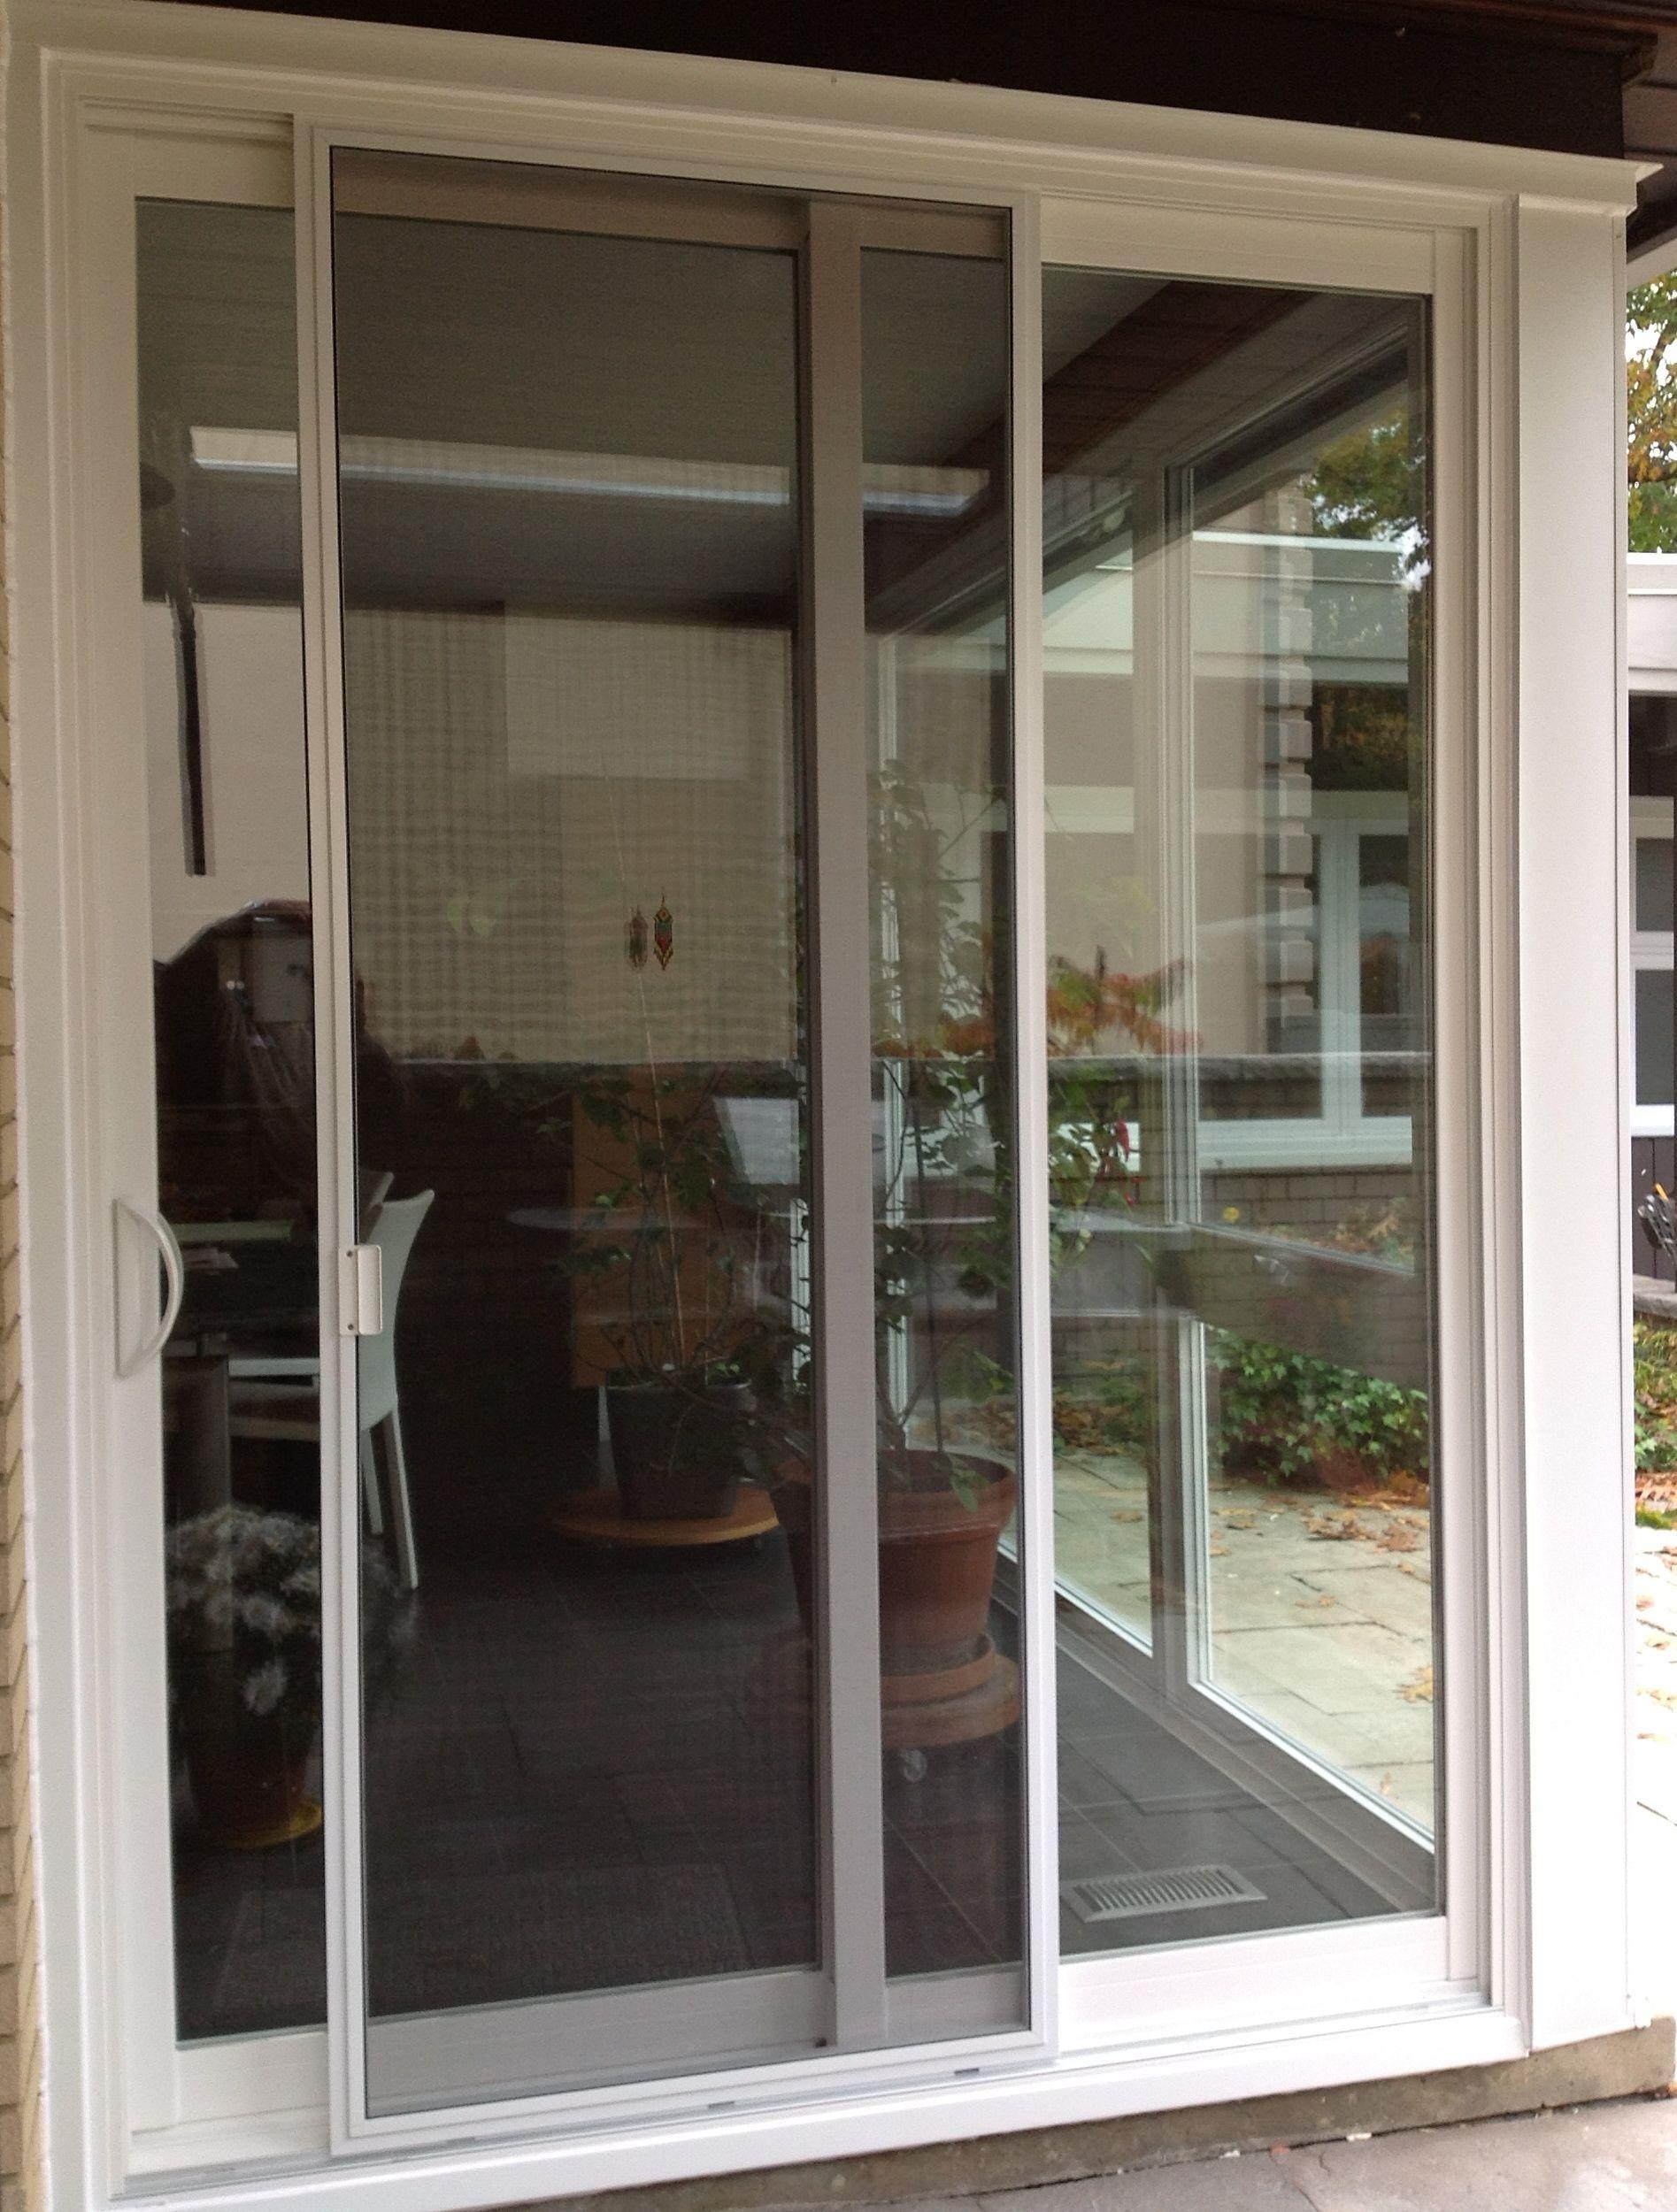 all foldable doors u interior peytonmeyer lag fascinating net trifold design wood door folding plastic l